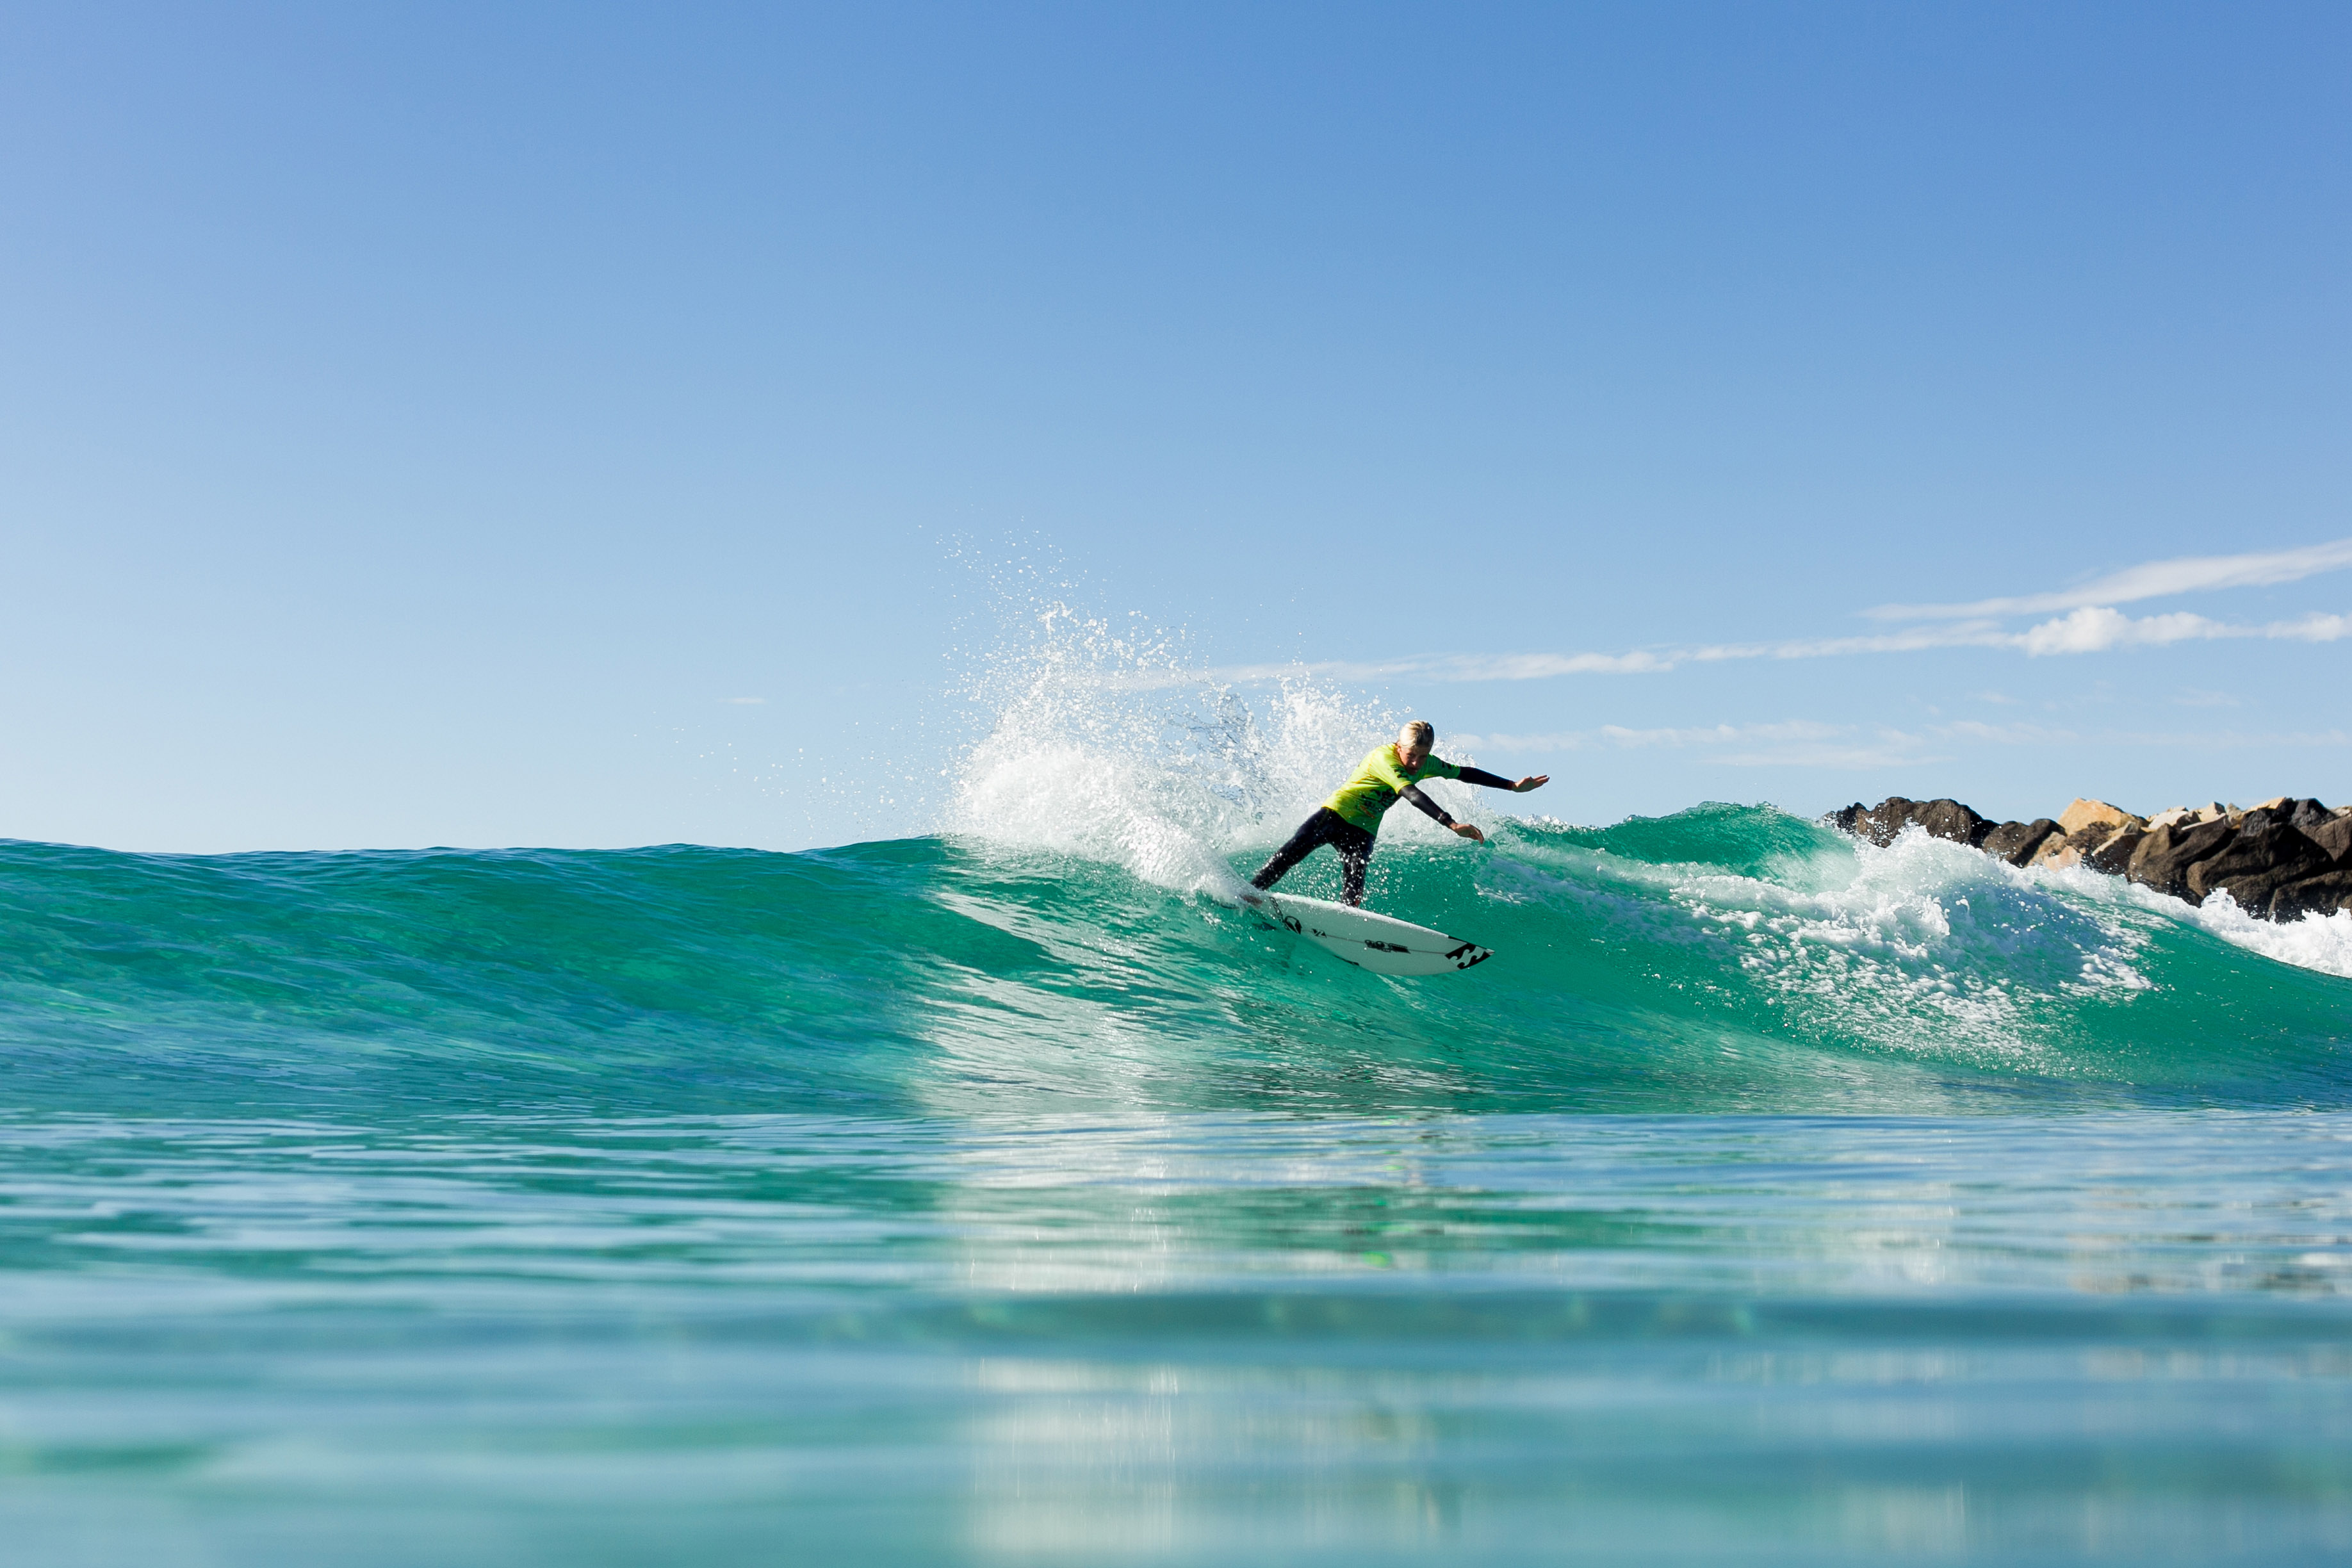 billabong competitors in australia